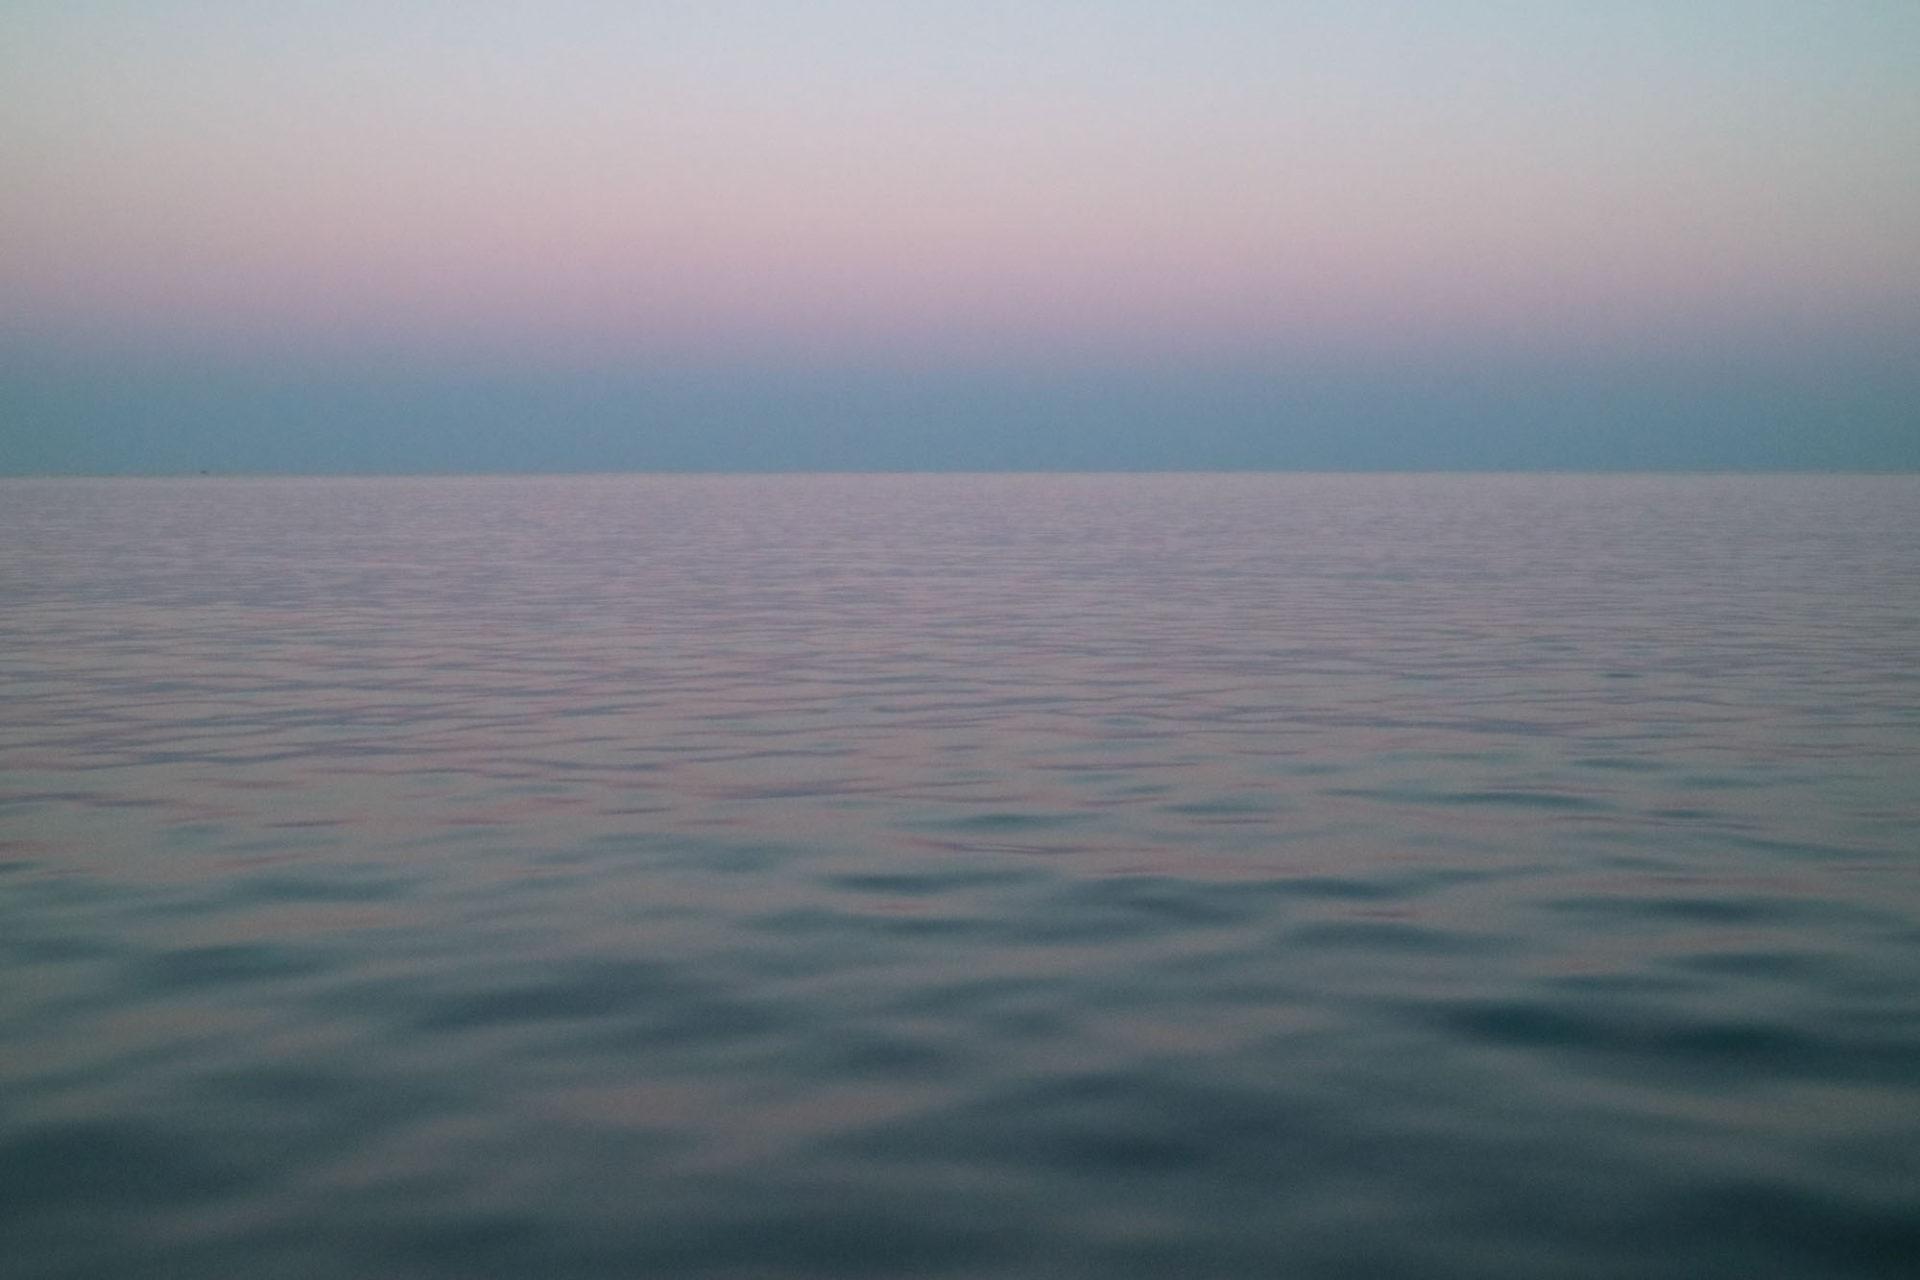 Fotografin - Daniela Hürlimann - Pastelltöne Meer Horizont